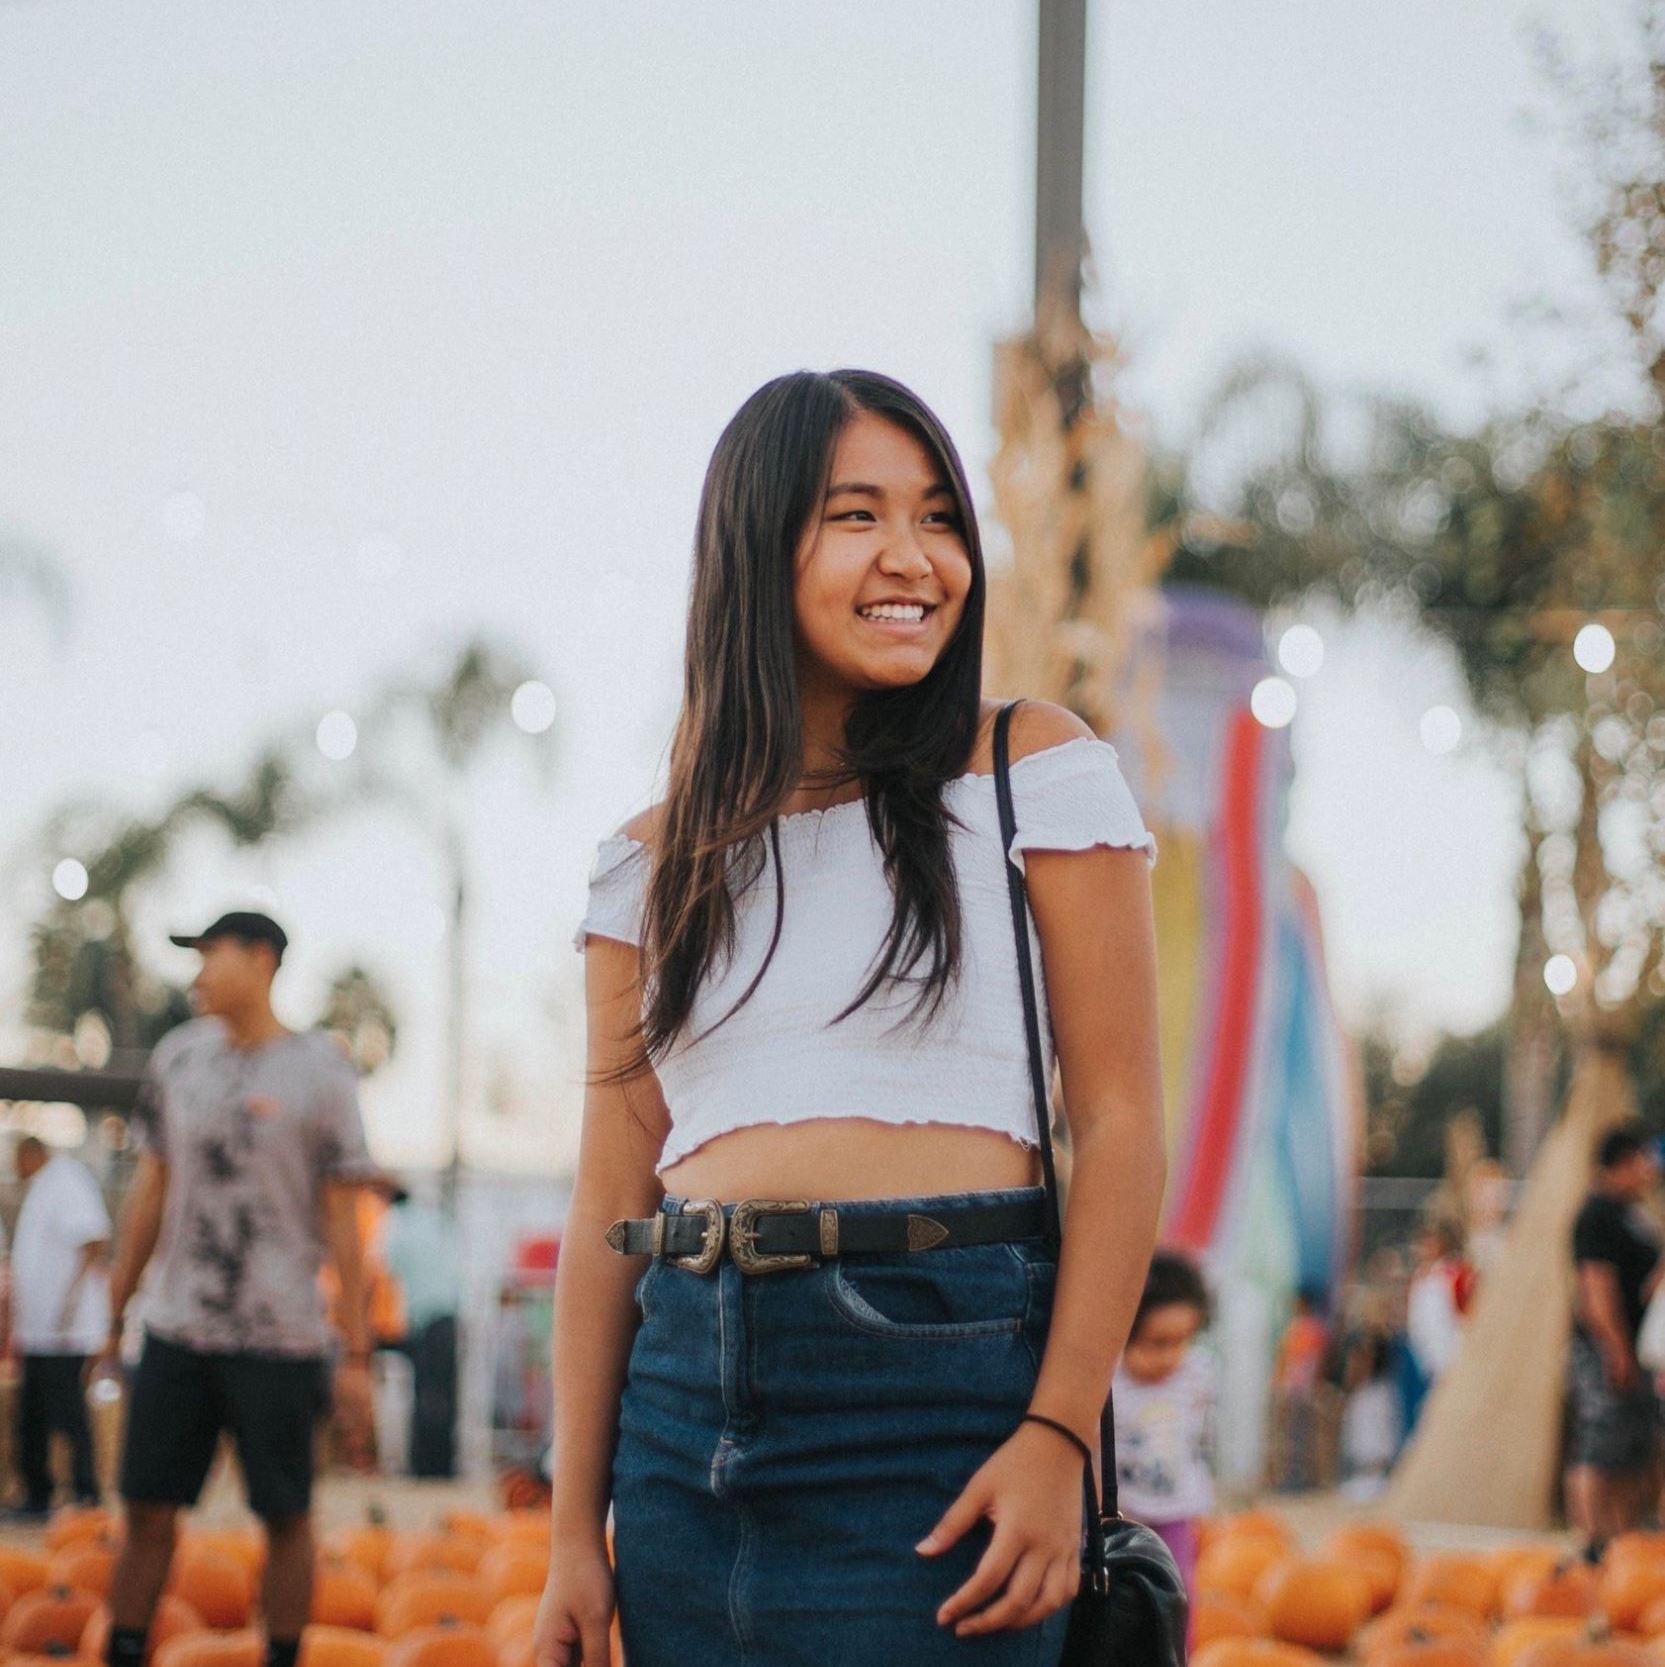 Melisa  (@melisacya)  Worked as Social Media Manager for a VR startup